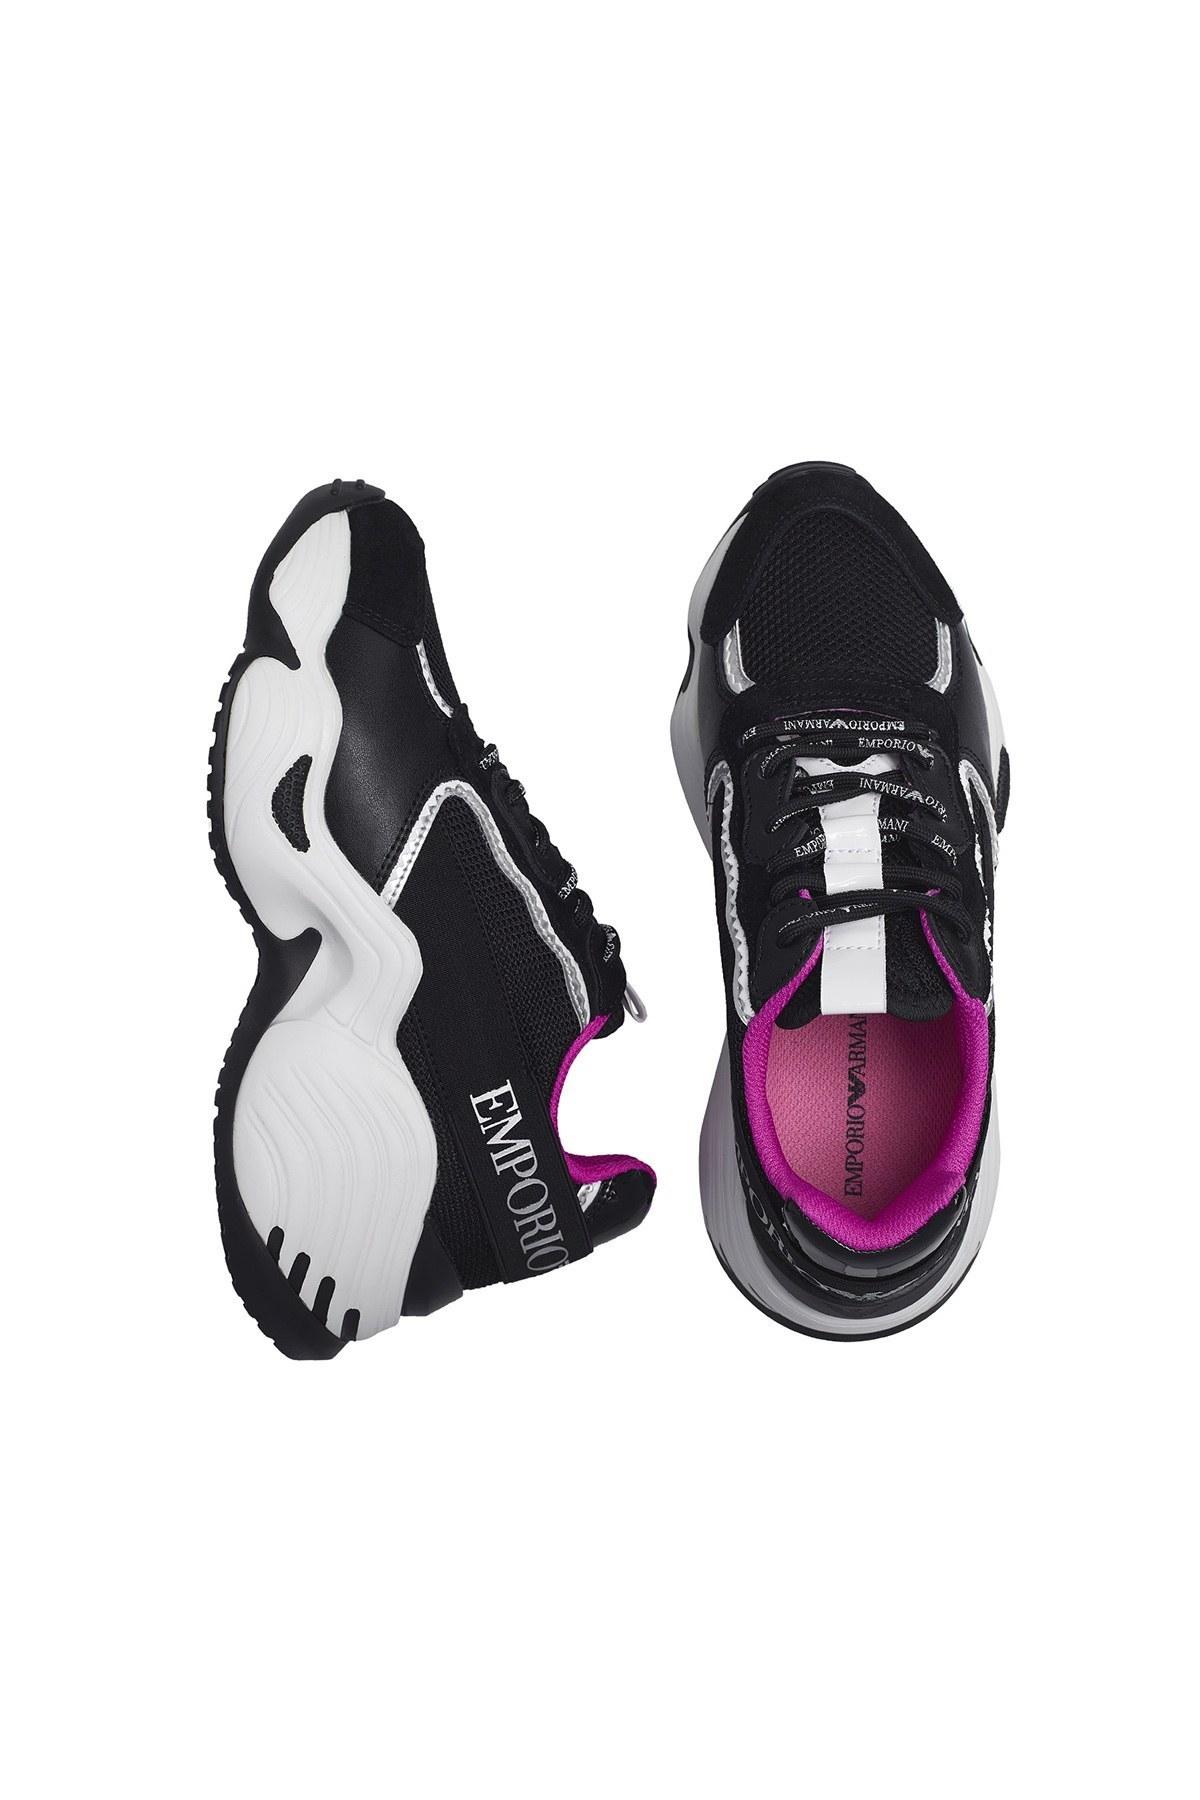 Emporio Armani Sneaker Kadın Ayakkabı X3X088 XM059 N102 SİYAH